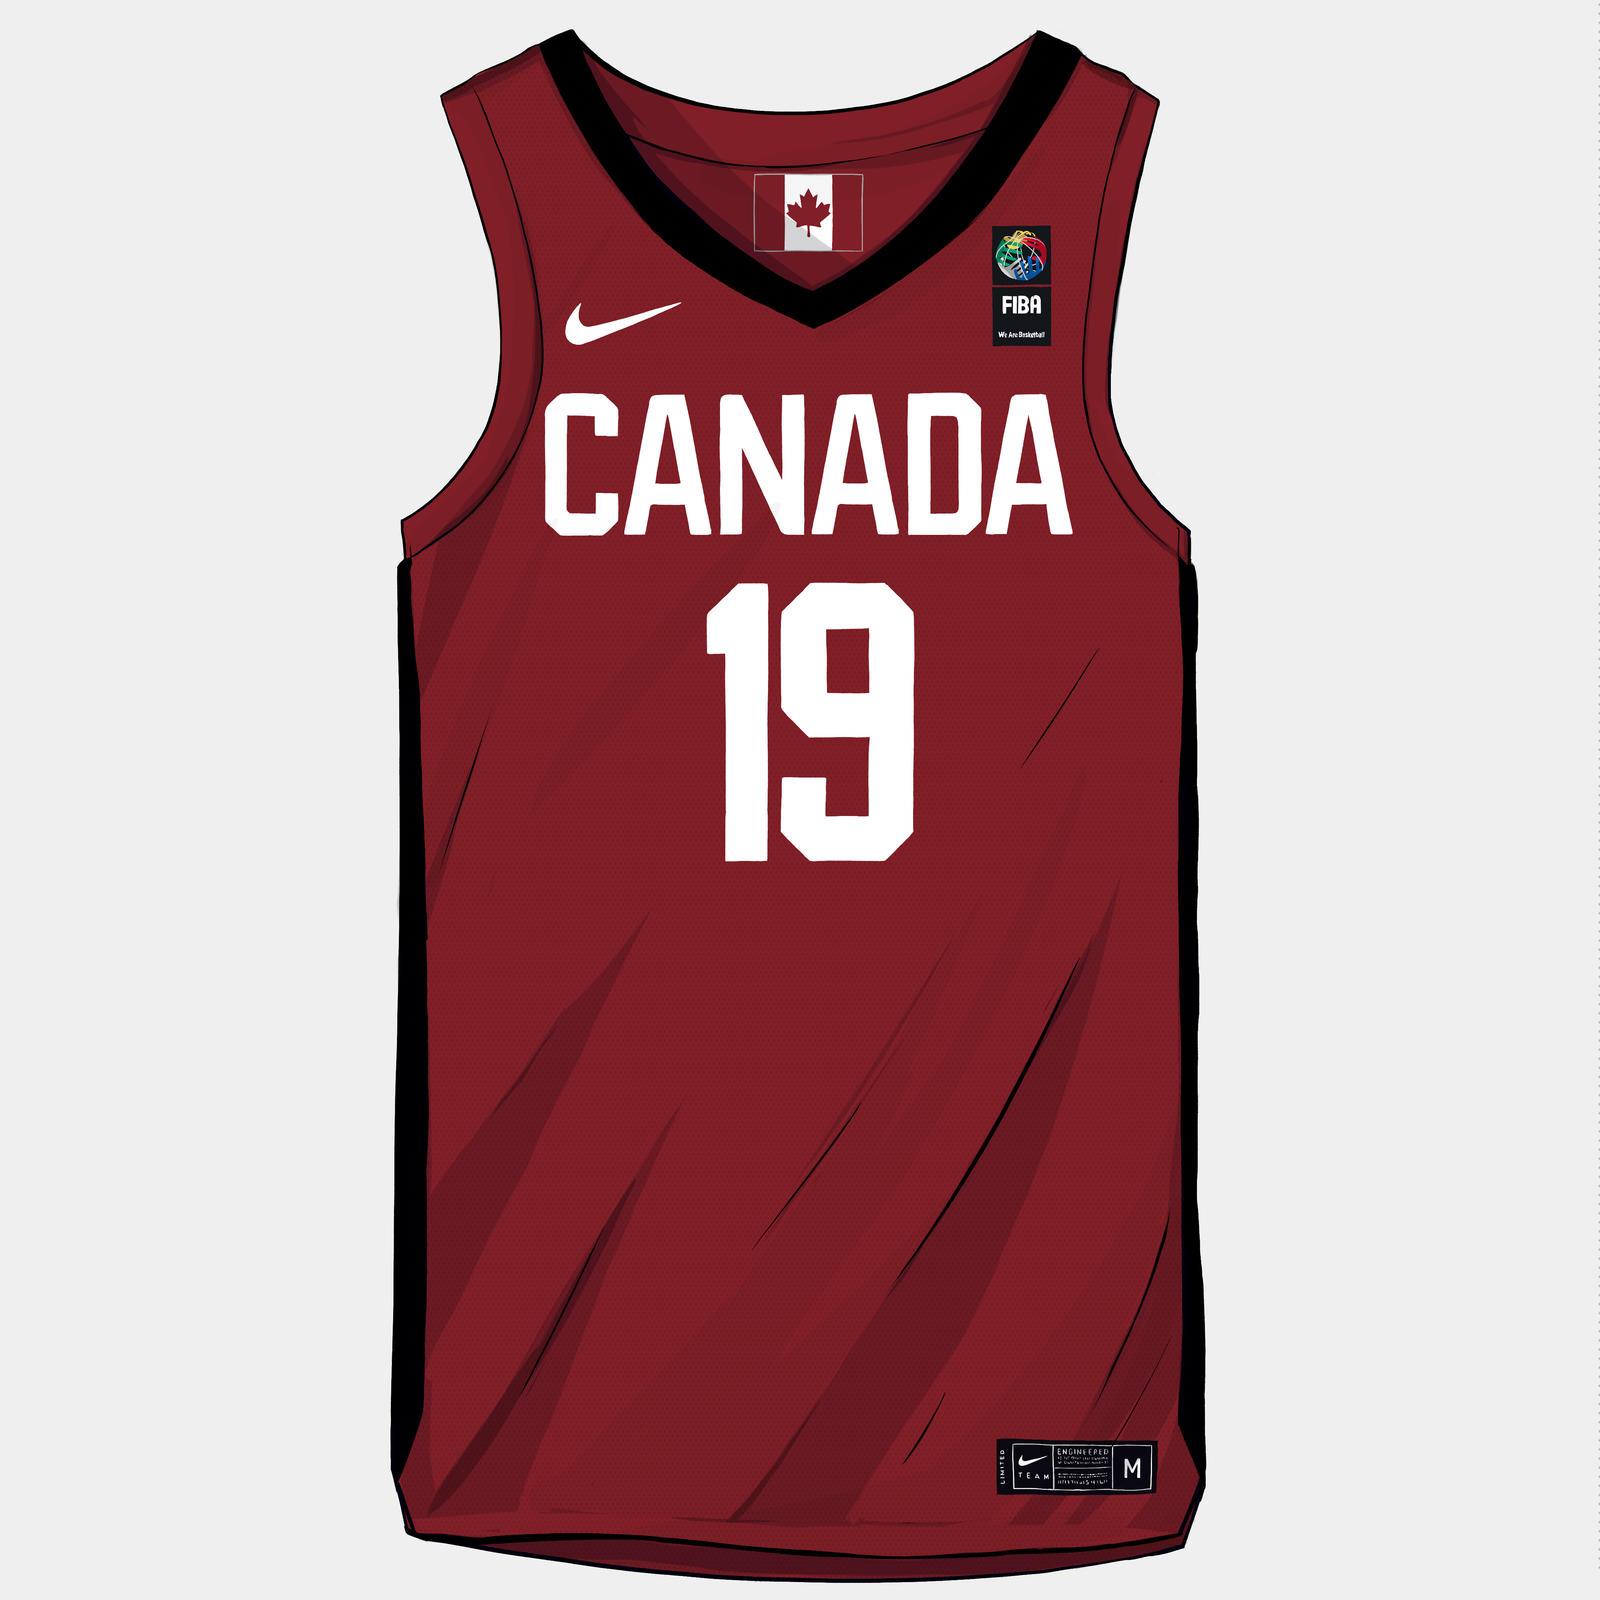 on sale 46eae e2d9c Nike and Jordan Brand Basketball Federation Uniforms FIBA ...